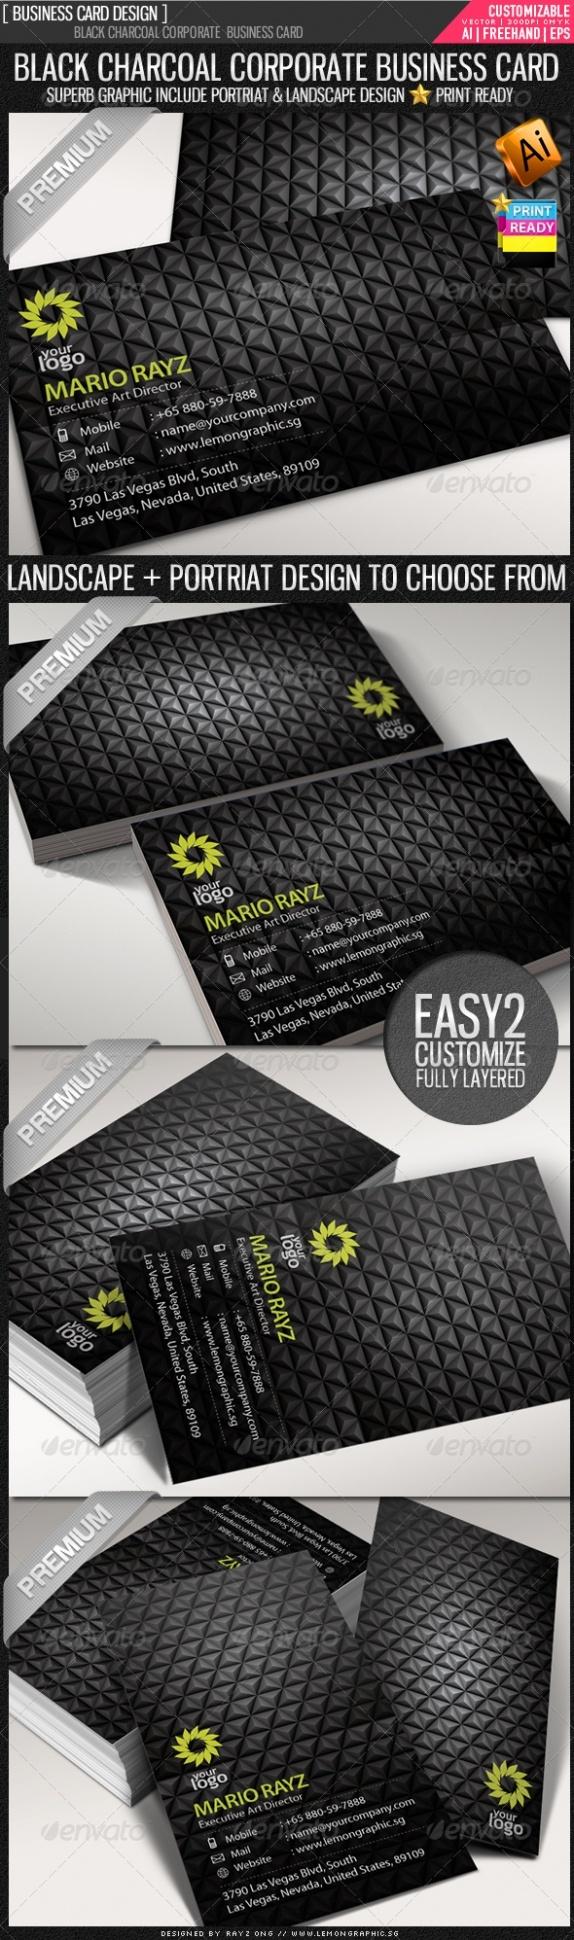 Black Charcoal Corporate Visit Card Template best namecard